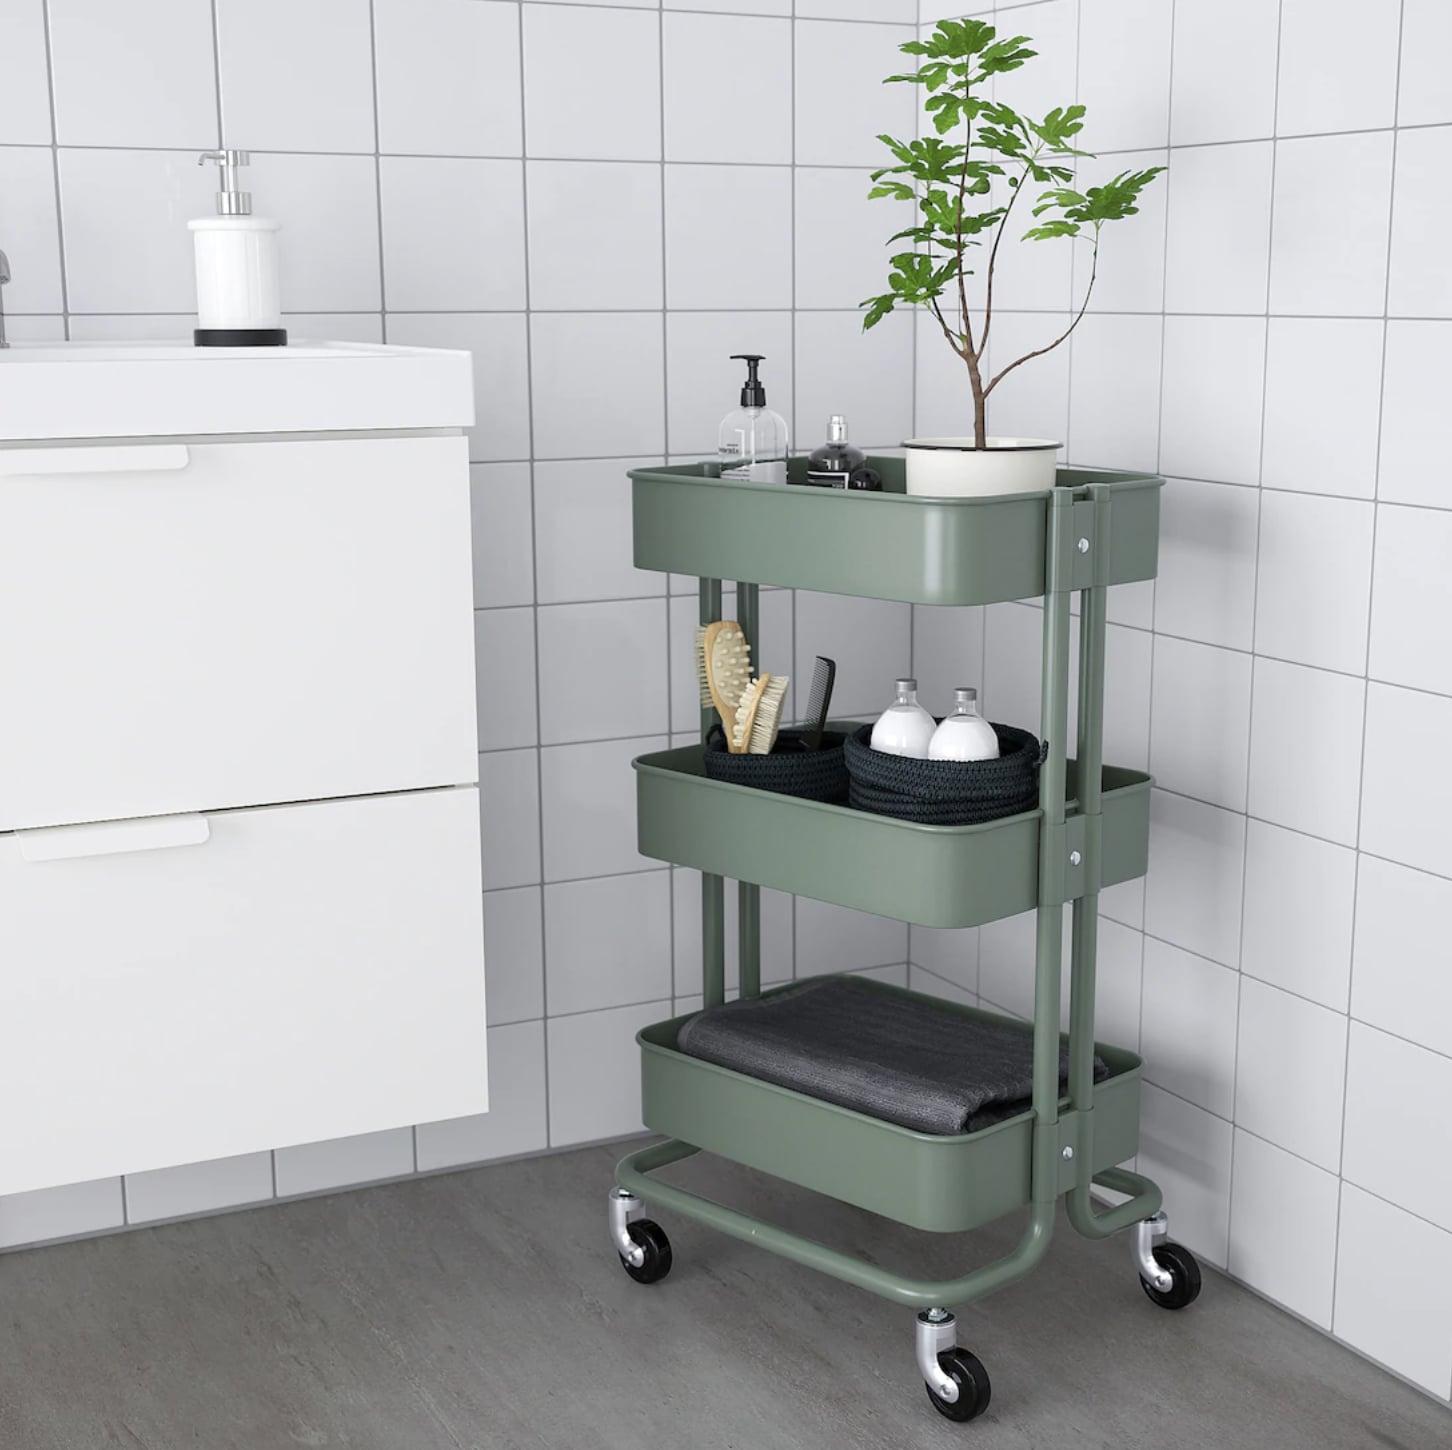 Raskog Utility Cart 50 Genius Bathroom Organization Products You Need From Ikea Popsugar Home Photo 43,700 Square Foot House Floor Plans